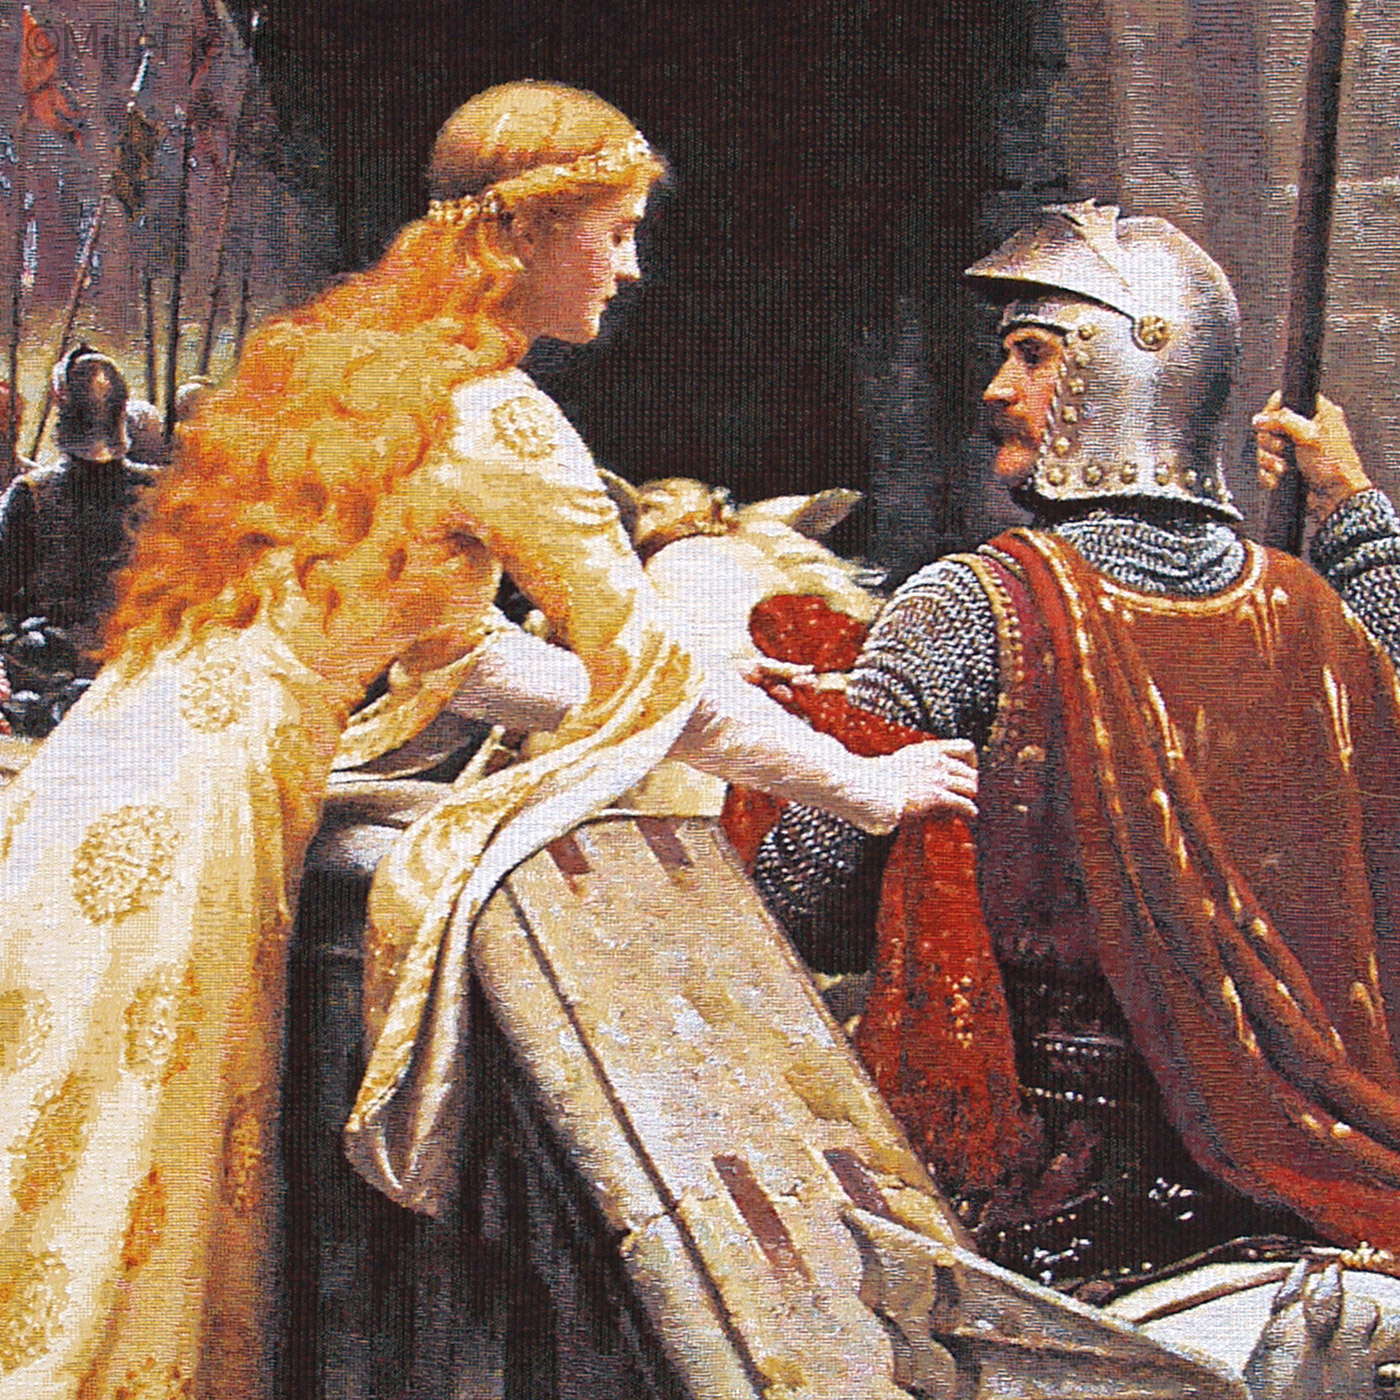 SDFSD Englands ber/ühmtes Gem/älde Godspeed Edmund Blair Leighton Poster gedruckt auf Leinwand Wandbild Wohnzimmer dekorative Kunst Malerei 30X40CM